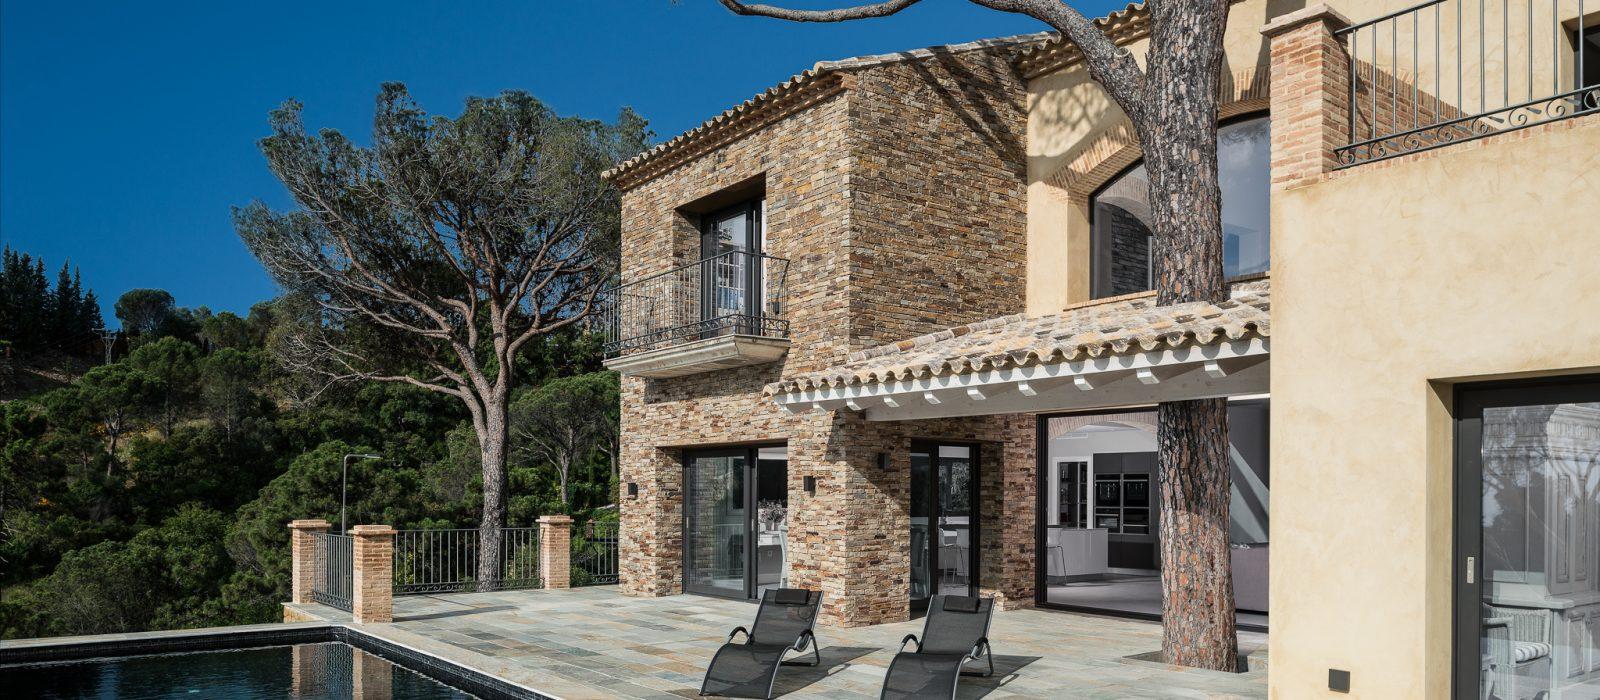 The perfect exclusive holiday at Villa La Sorpresa in a secluded private estate.